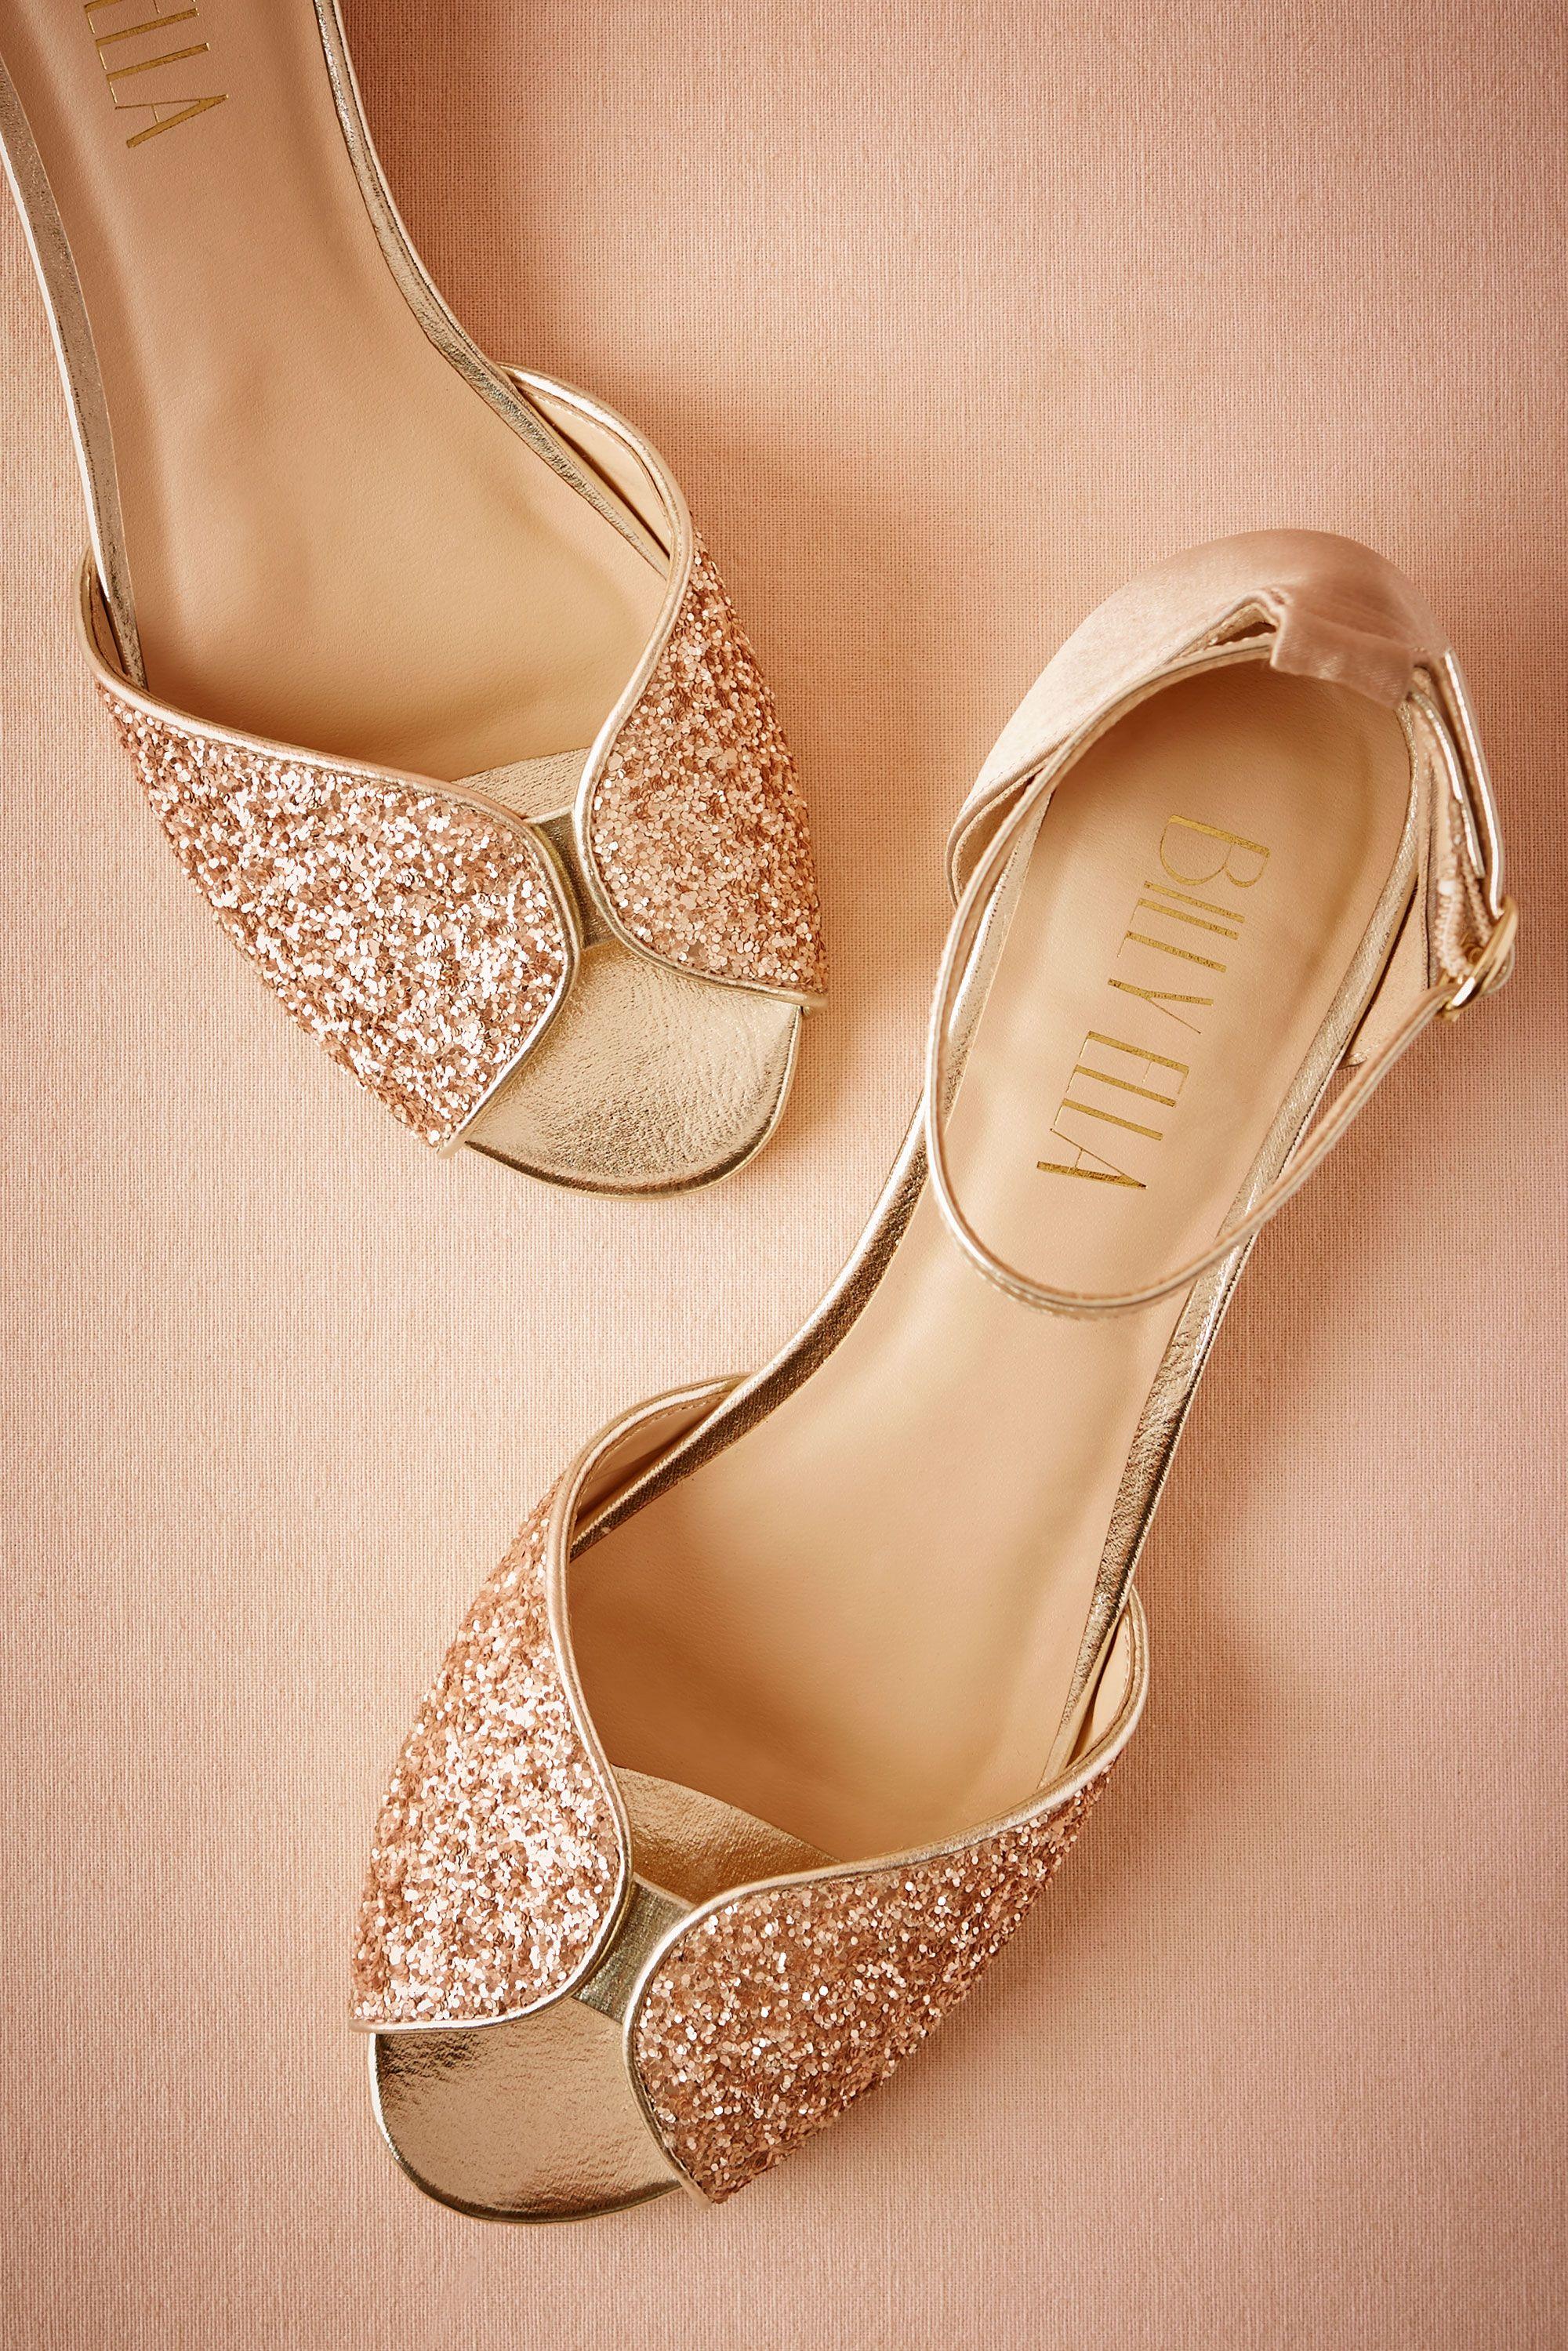 Wedding Bridal Shoes Flats wedding dress shoes bridal bhldn jeni flats